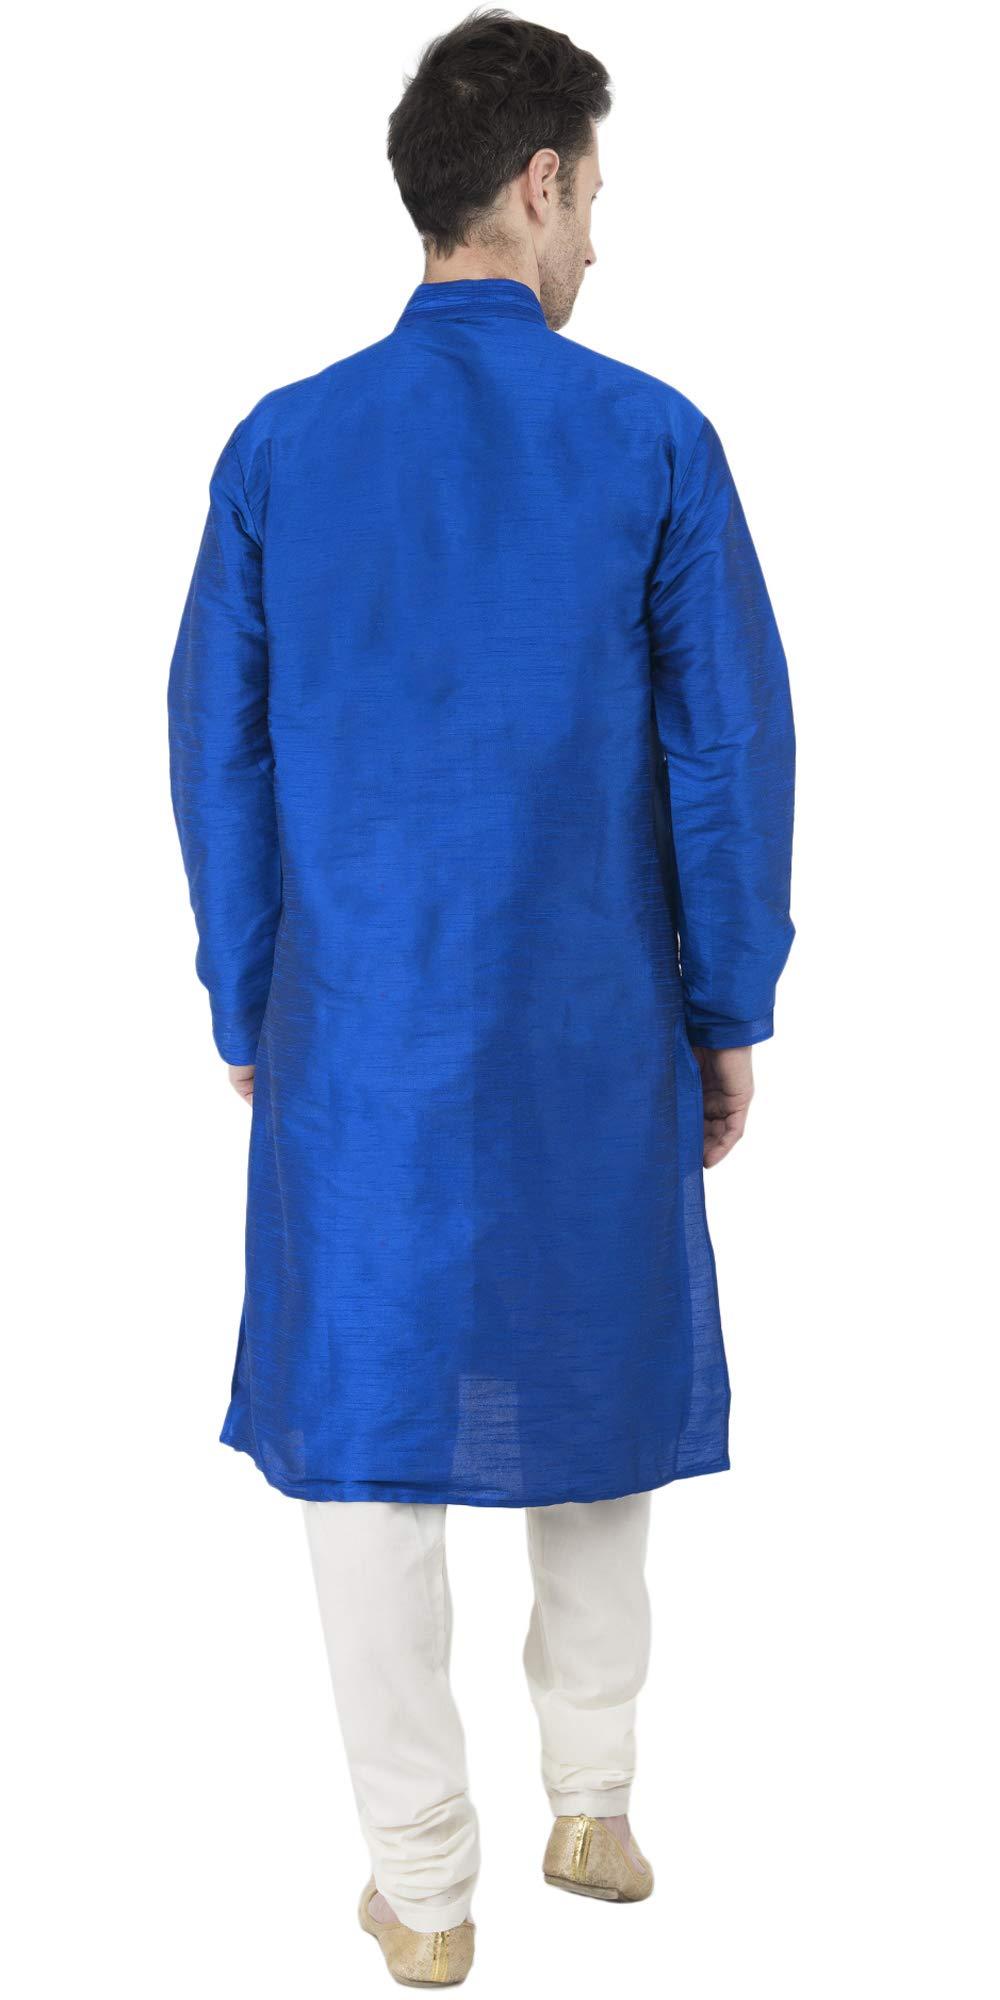 Kurta Pajama Long Sleeve Button Down Dress Shirt Indian Men Wedding Ethnic Casual Dress Traditional Set -XL by SKAVIJ (Image #5)